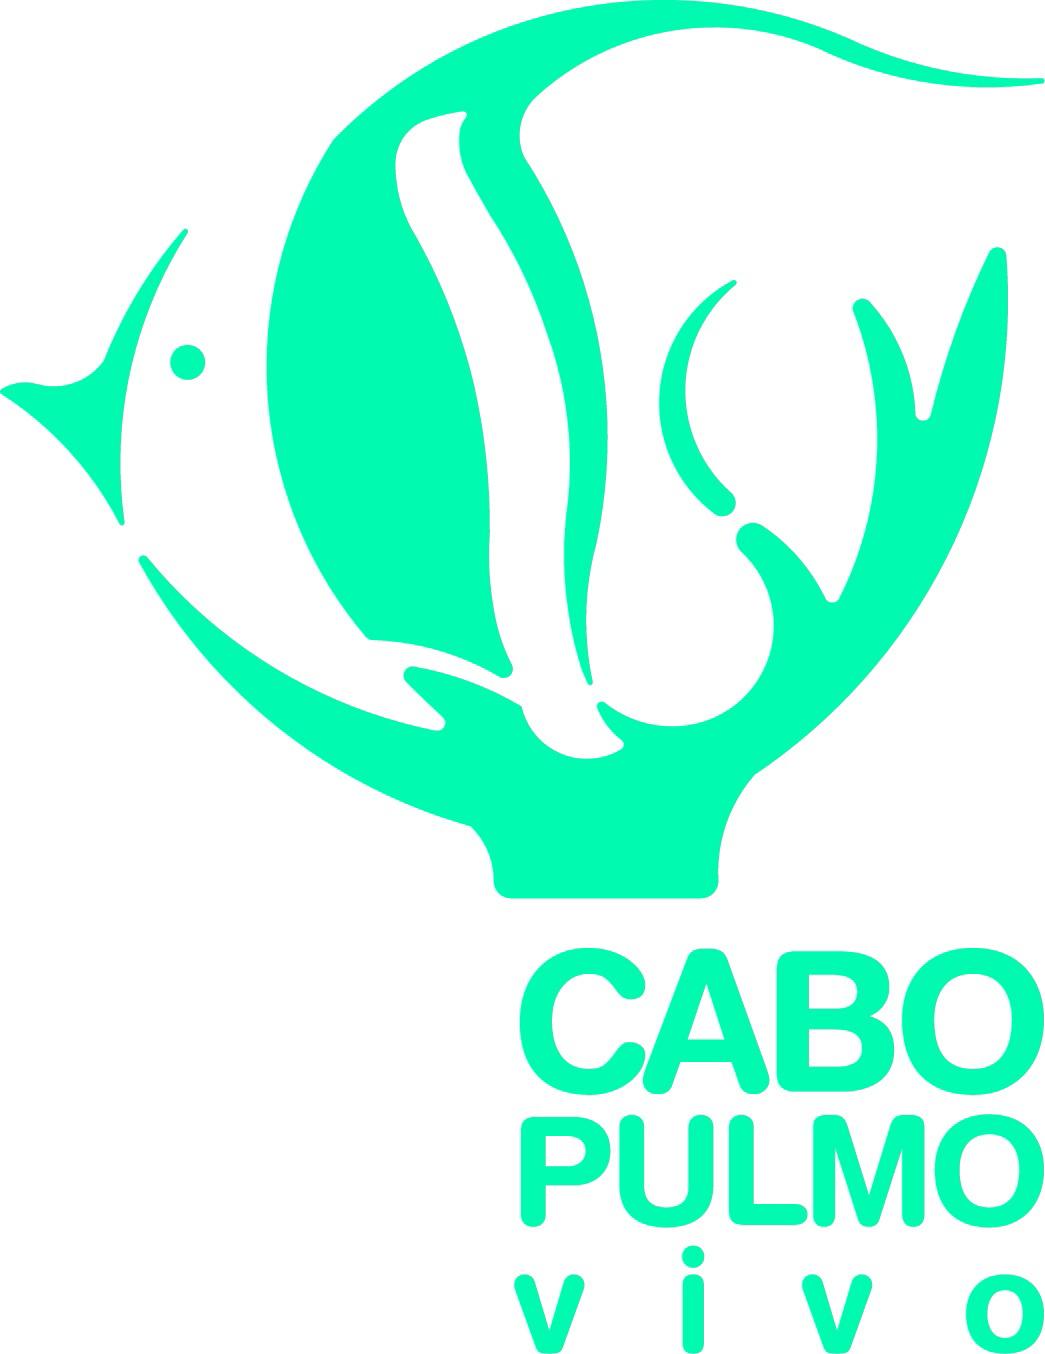 CABO PULMO logo azul.jpg